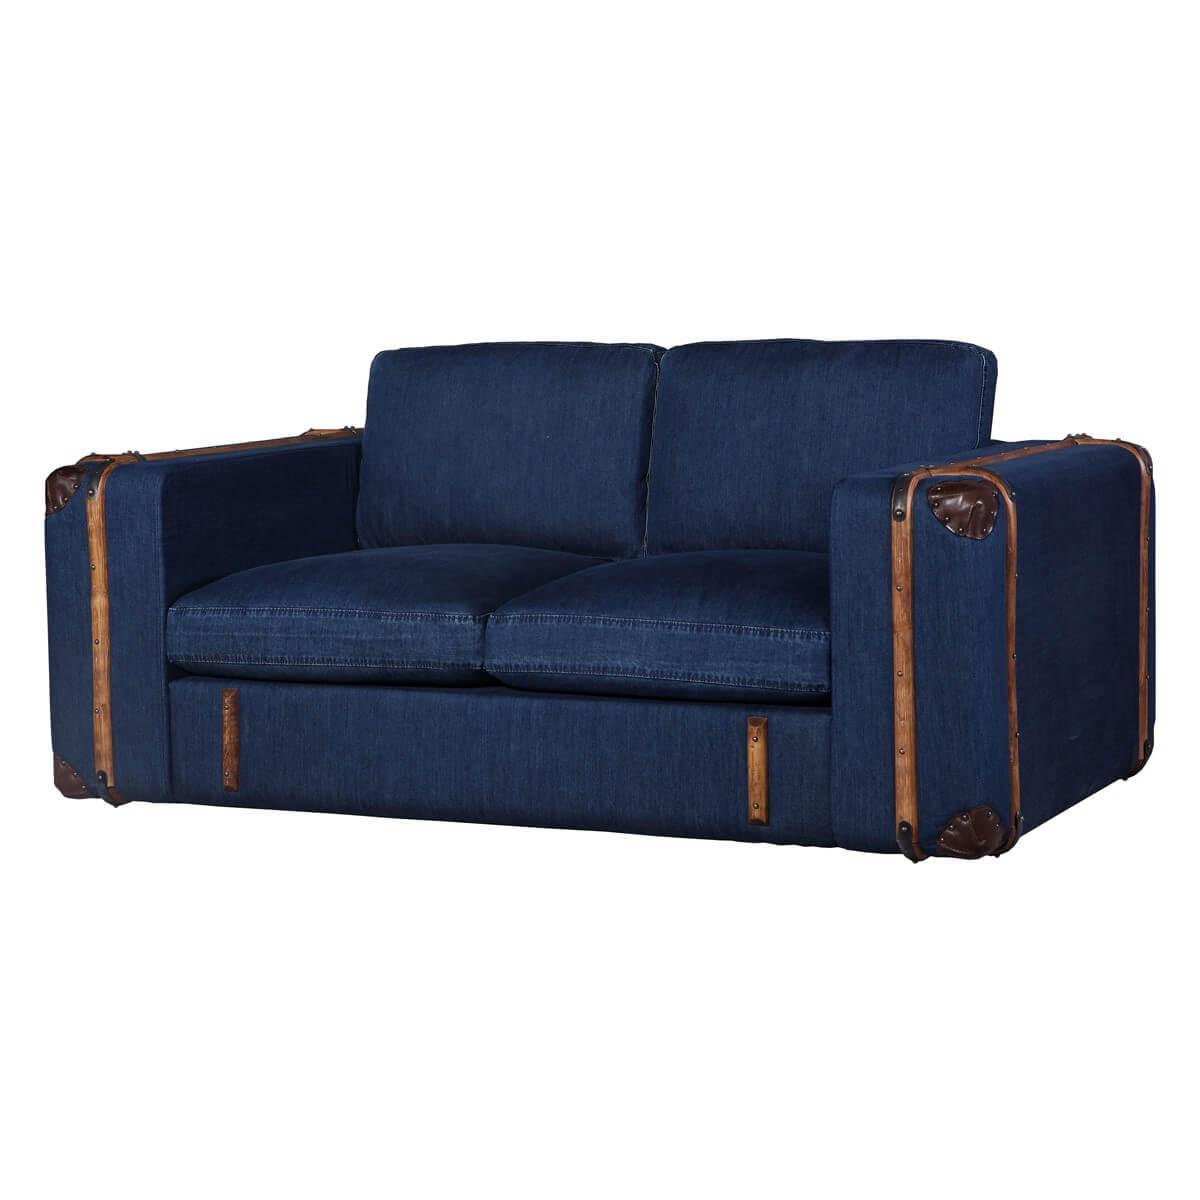 sofa grena 2 sitzer in jeansstoff blau. Black Bedroom Furniture Sets. Home Design Ideas